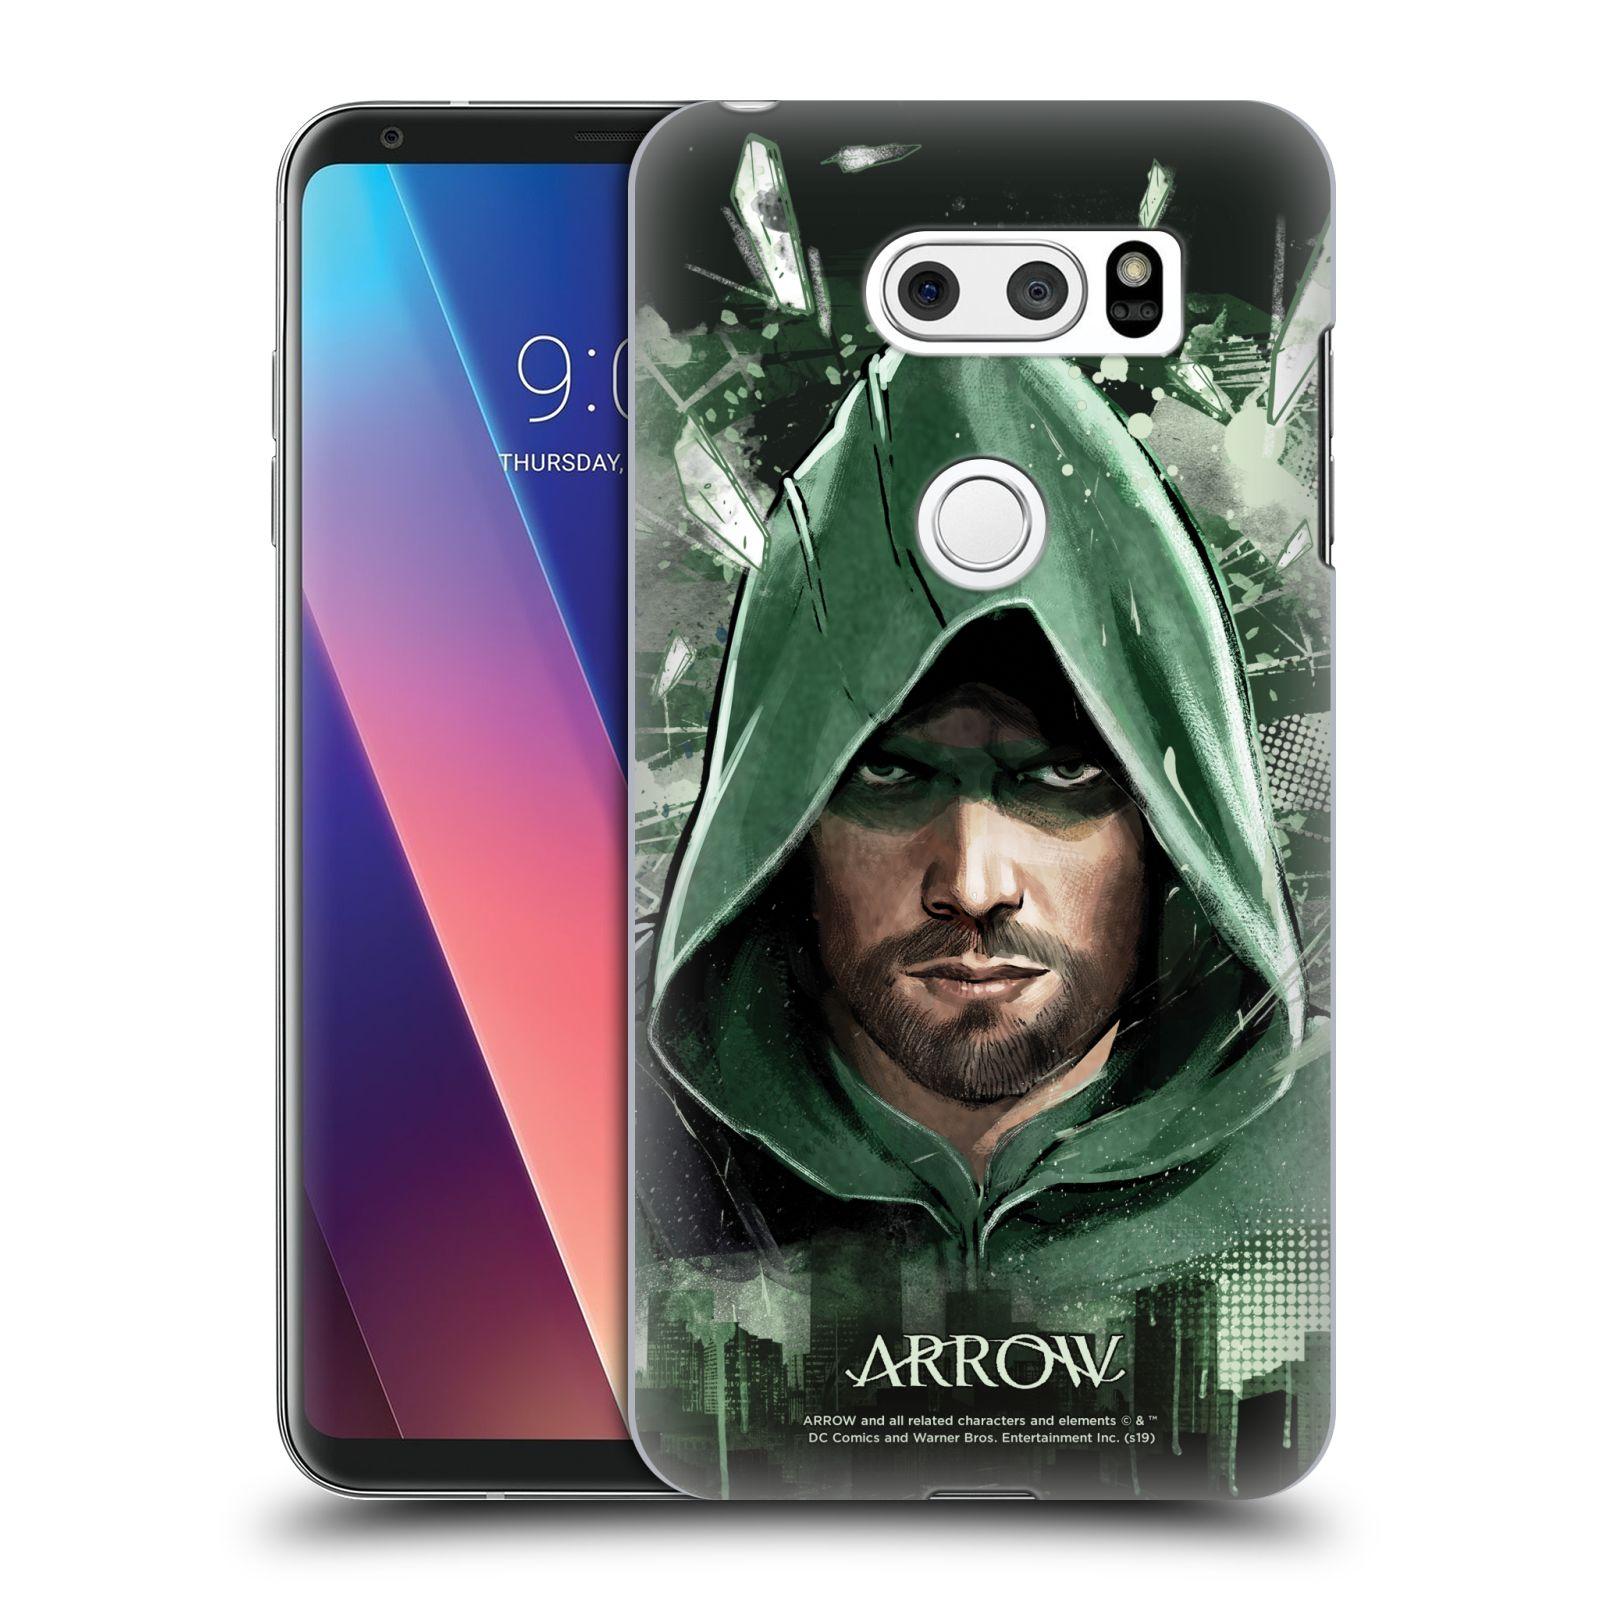 Pouzdro na mobil LG V30 - HEAD CASE - Seriál Arrow - kreslený motiv